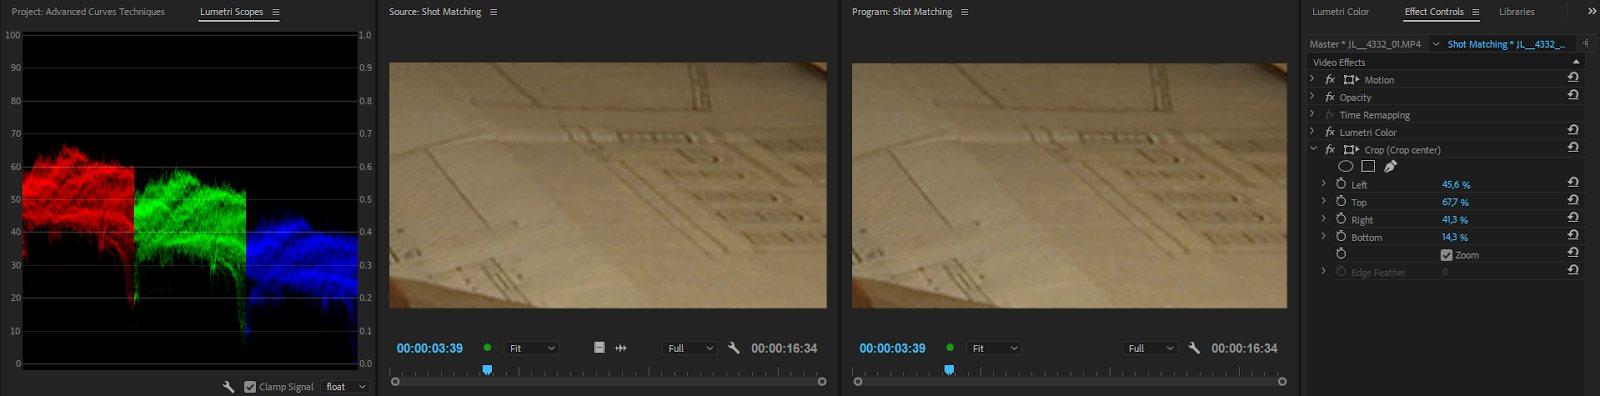 Использование инструмента Crop в Adobe Premiere Pro CC